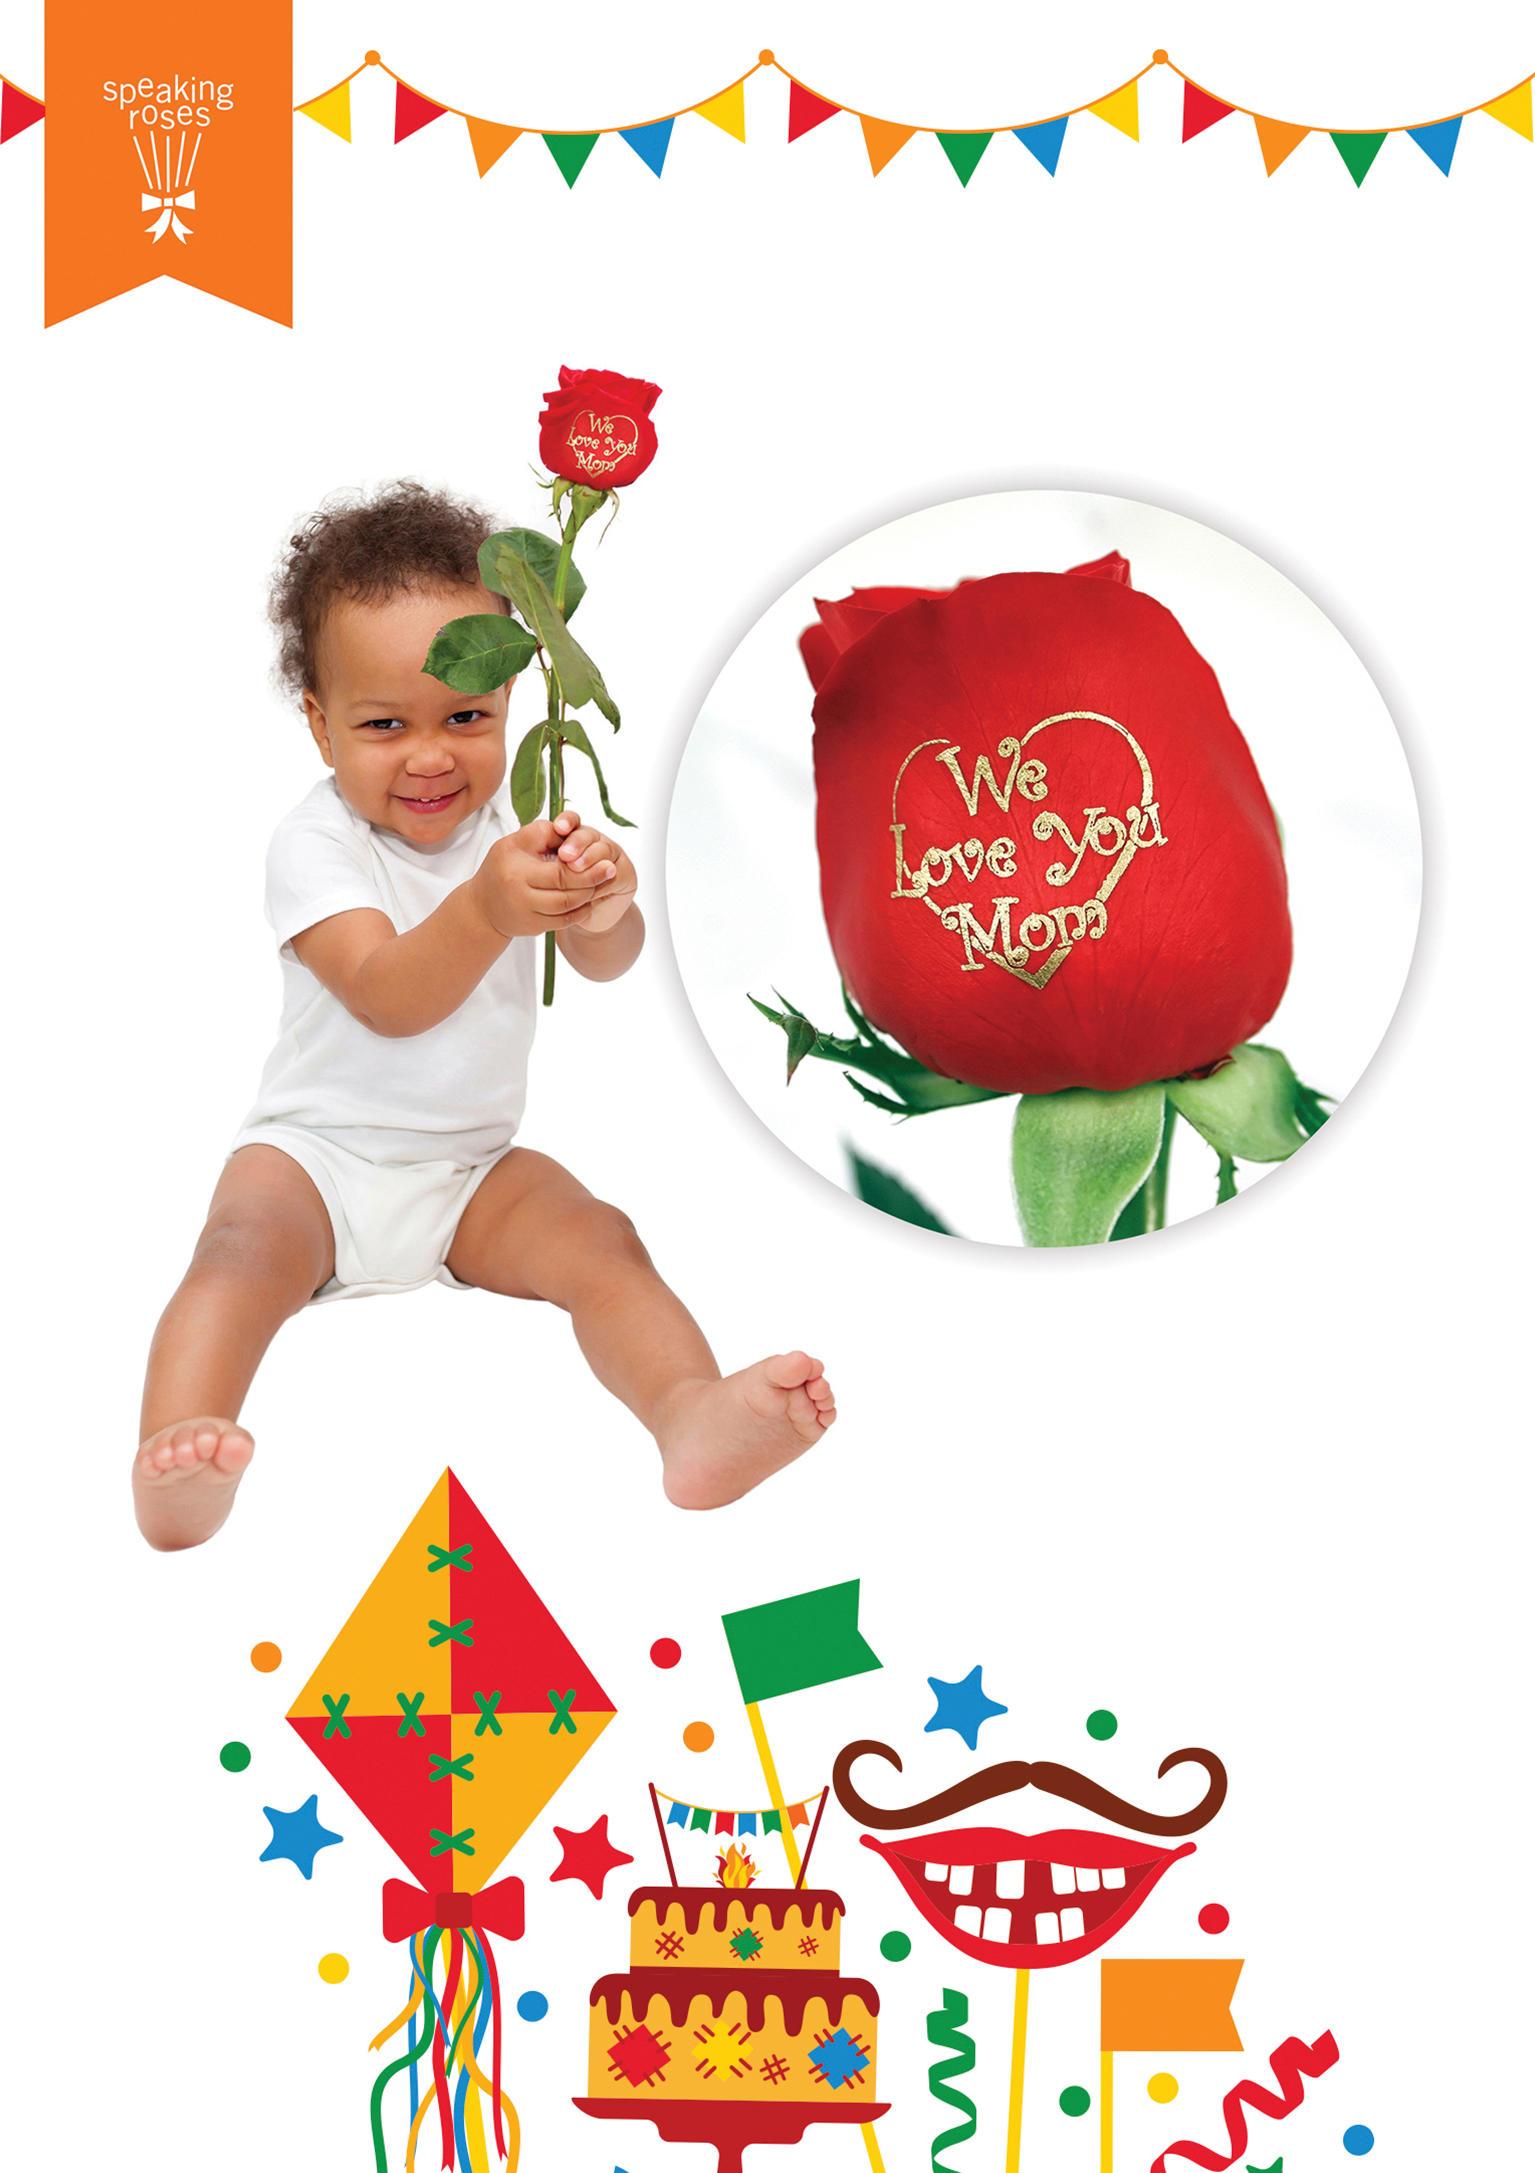 Speaking Roses International image 2